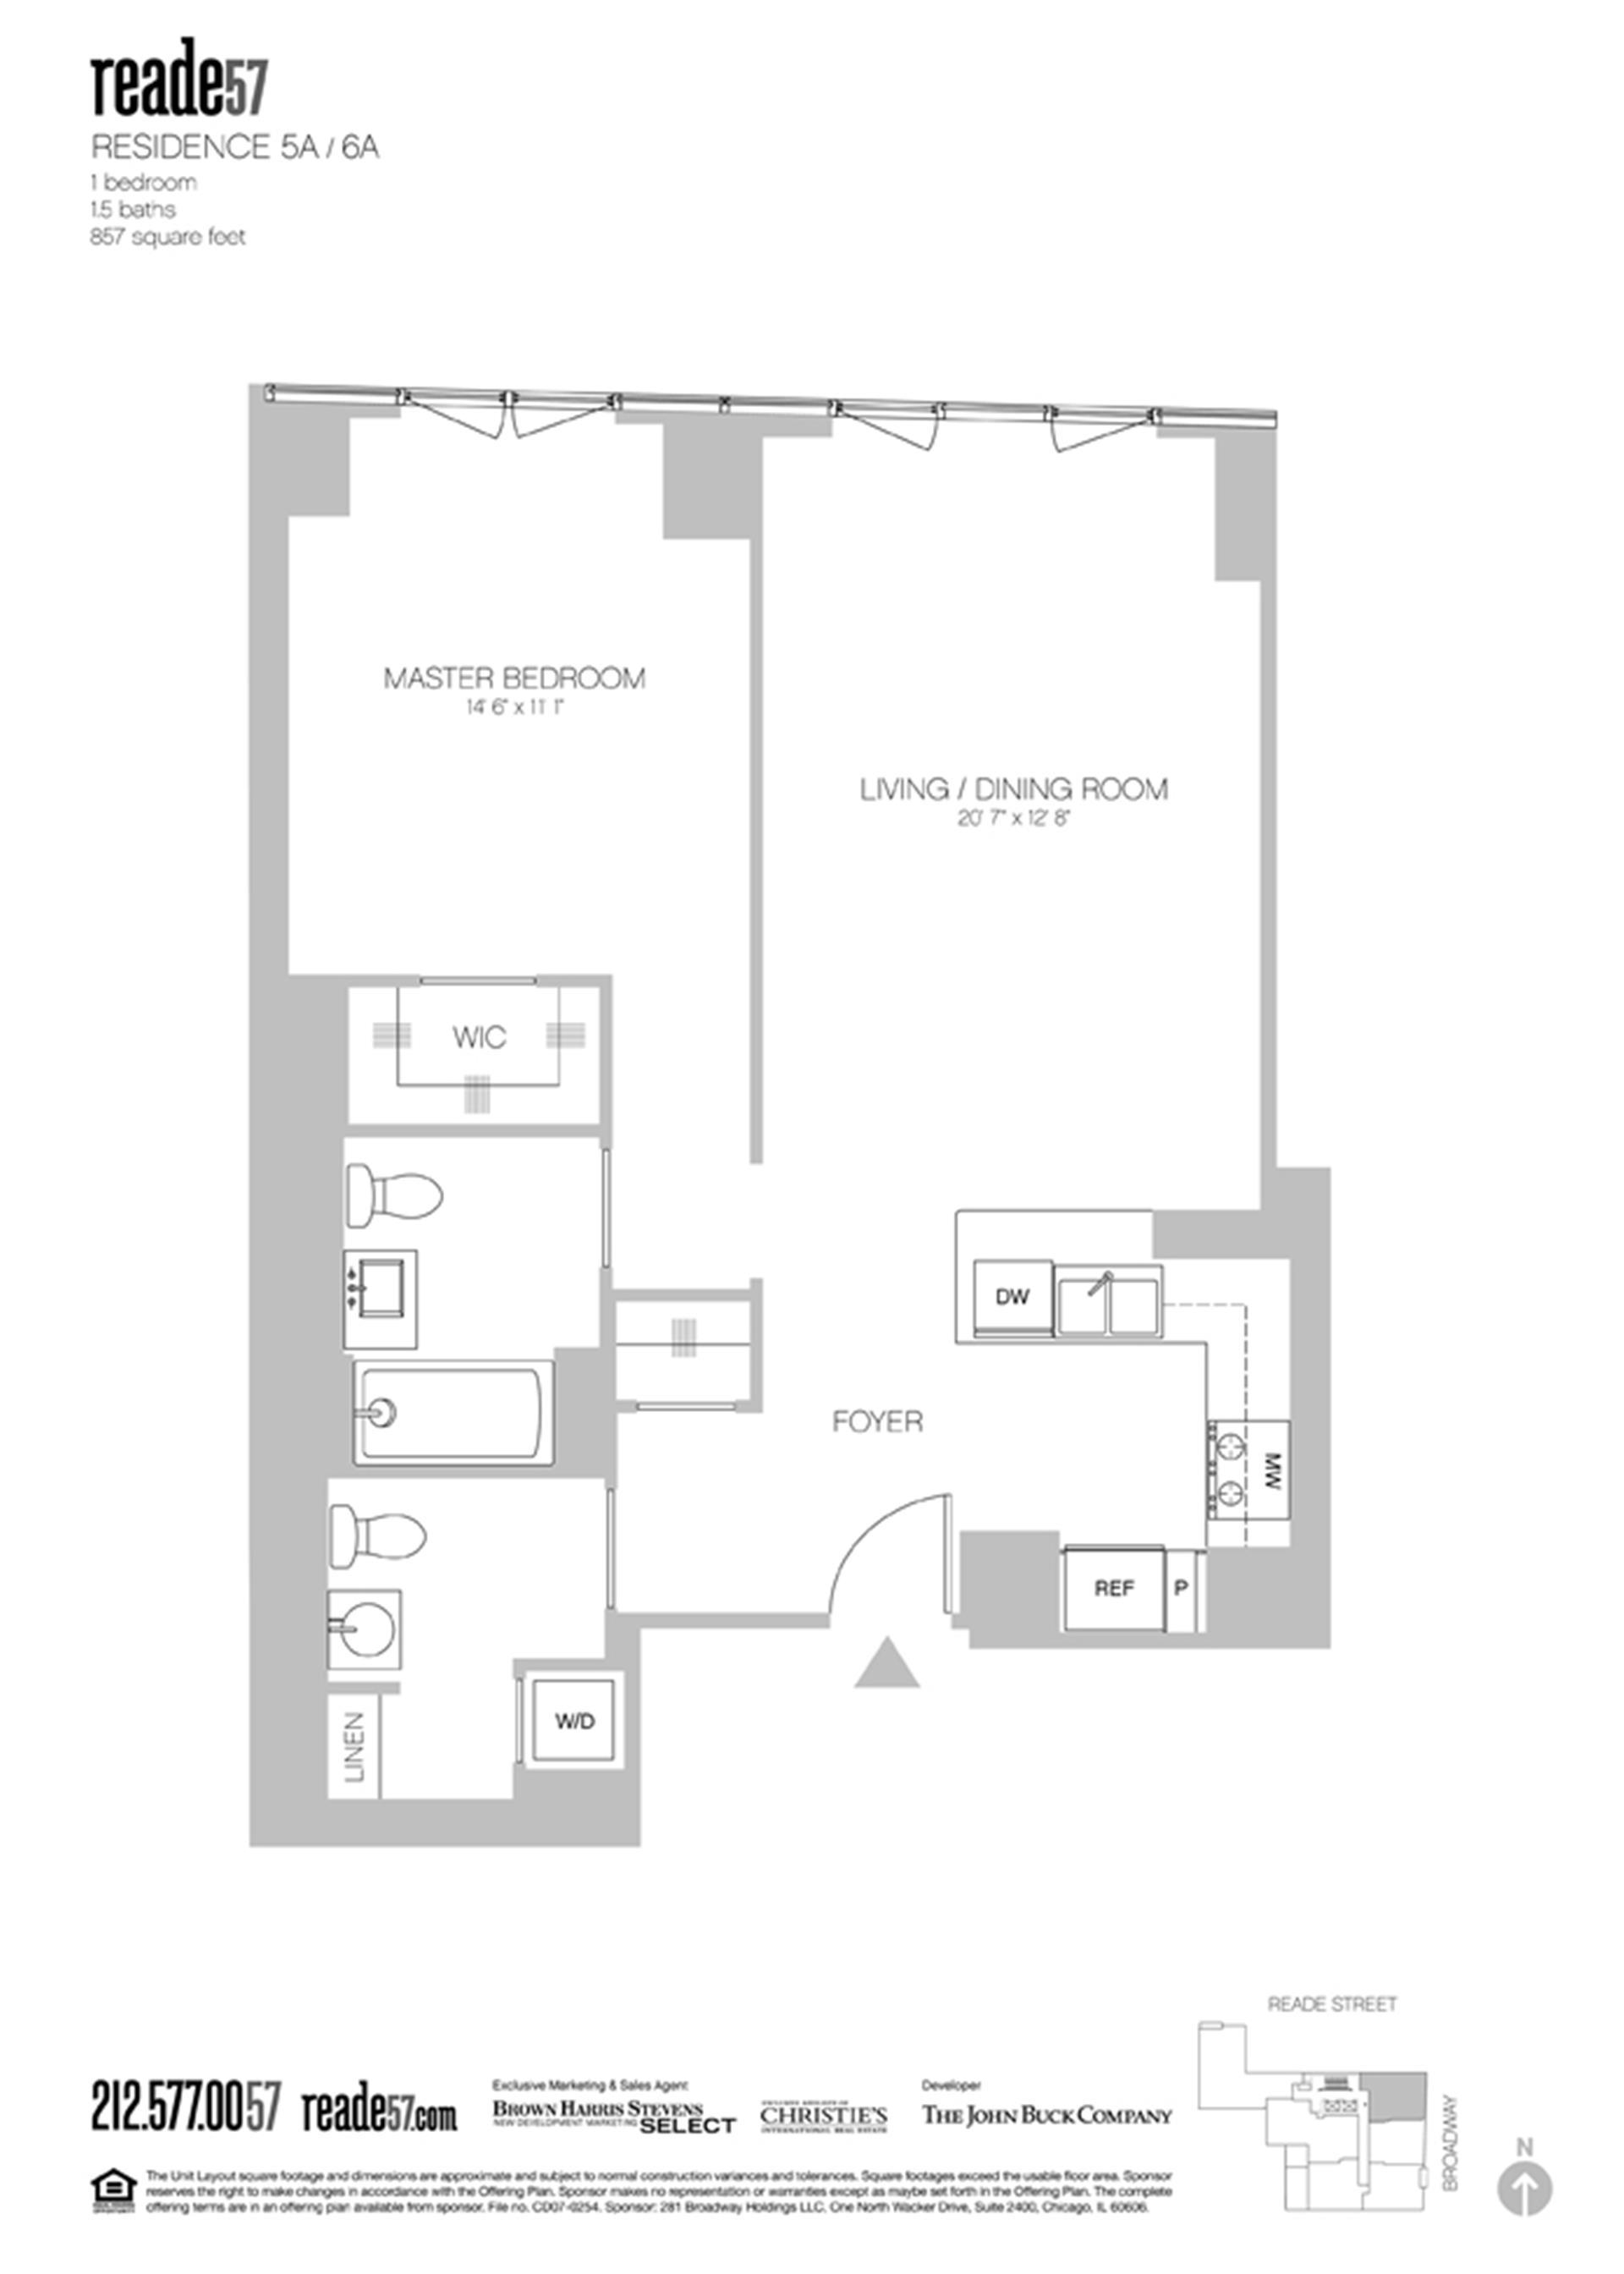 Floor plan of 57 Reade St, 6A - TriBeCa, New York